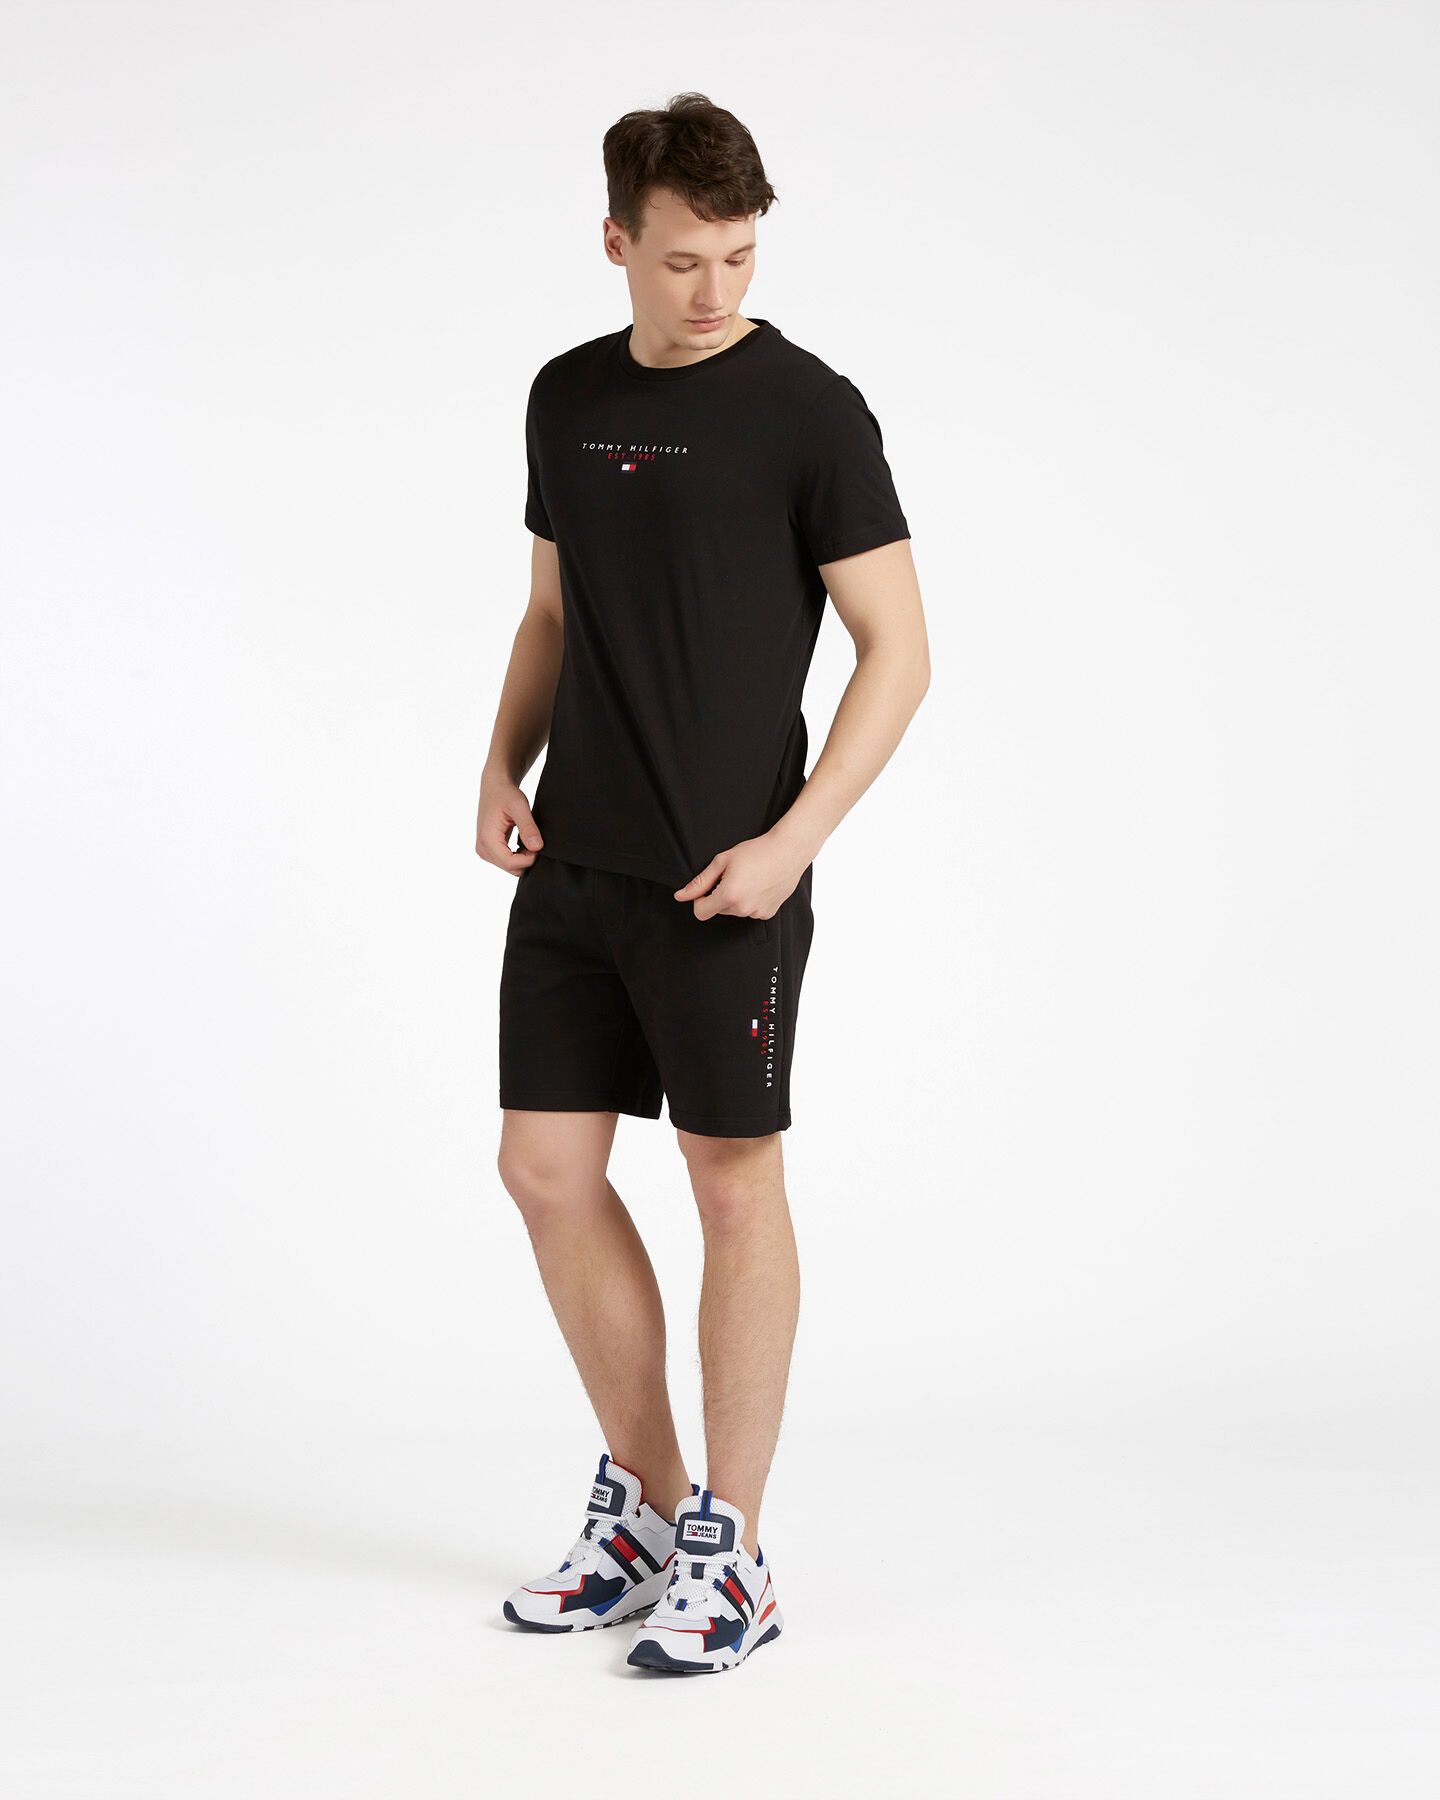 T-Shirt TOMMY HILFIGER ESSENTIAL M S4089510 scatto 1